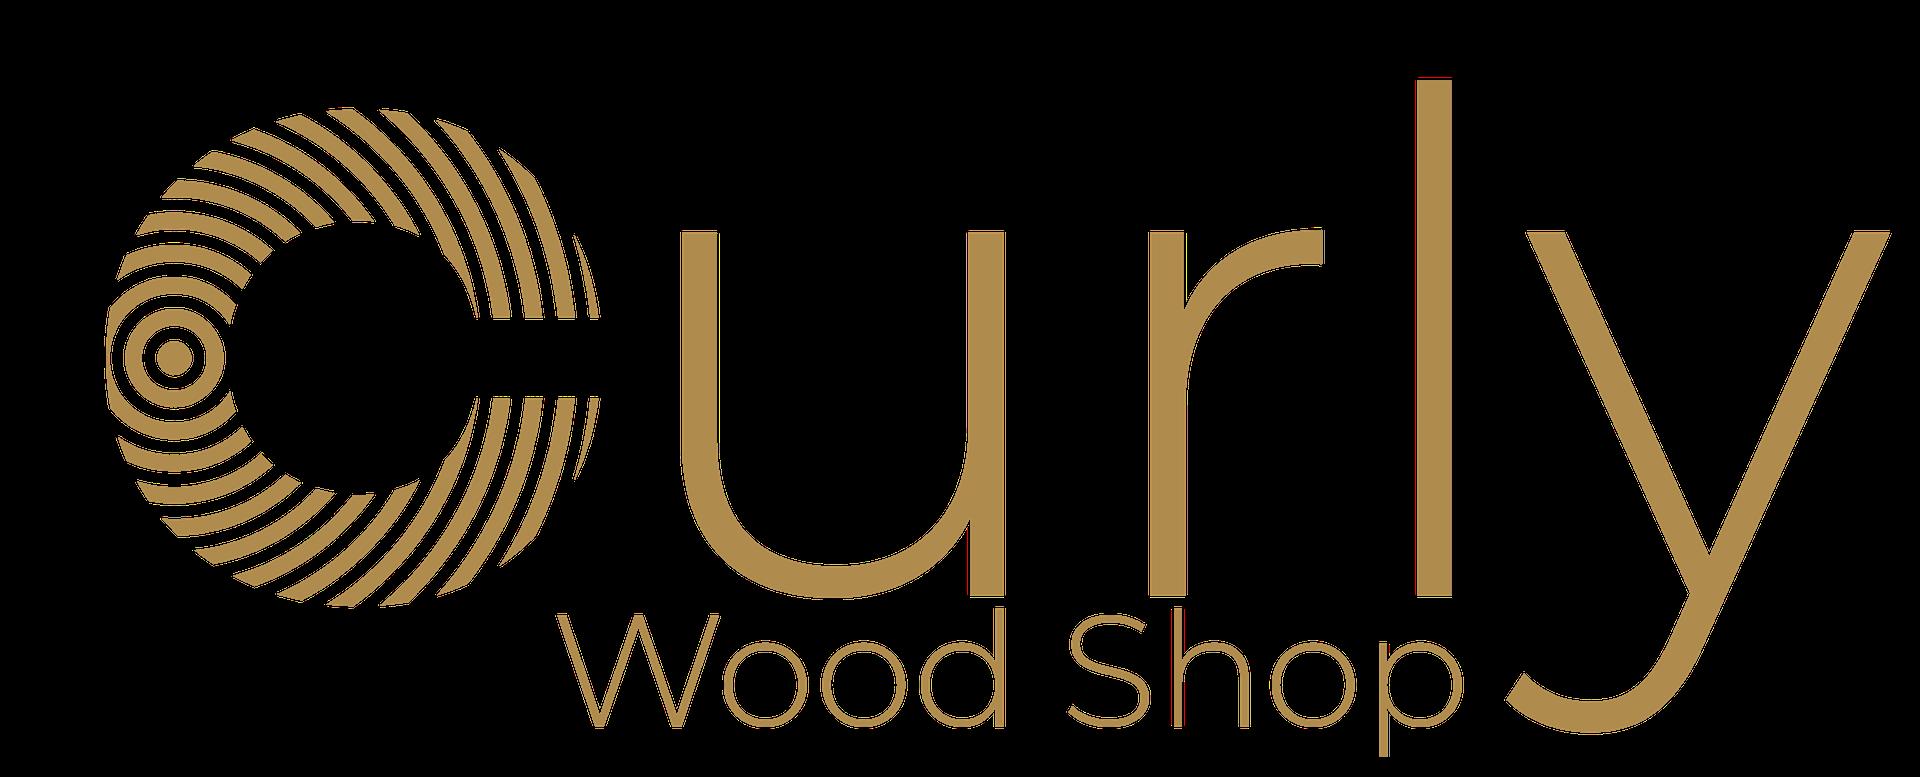 Curly Wood Shop